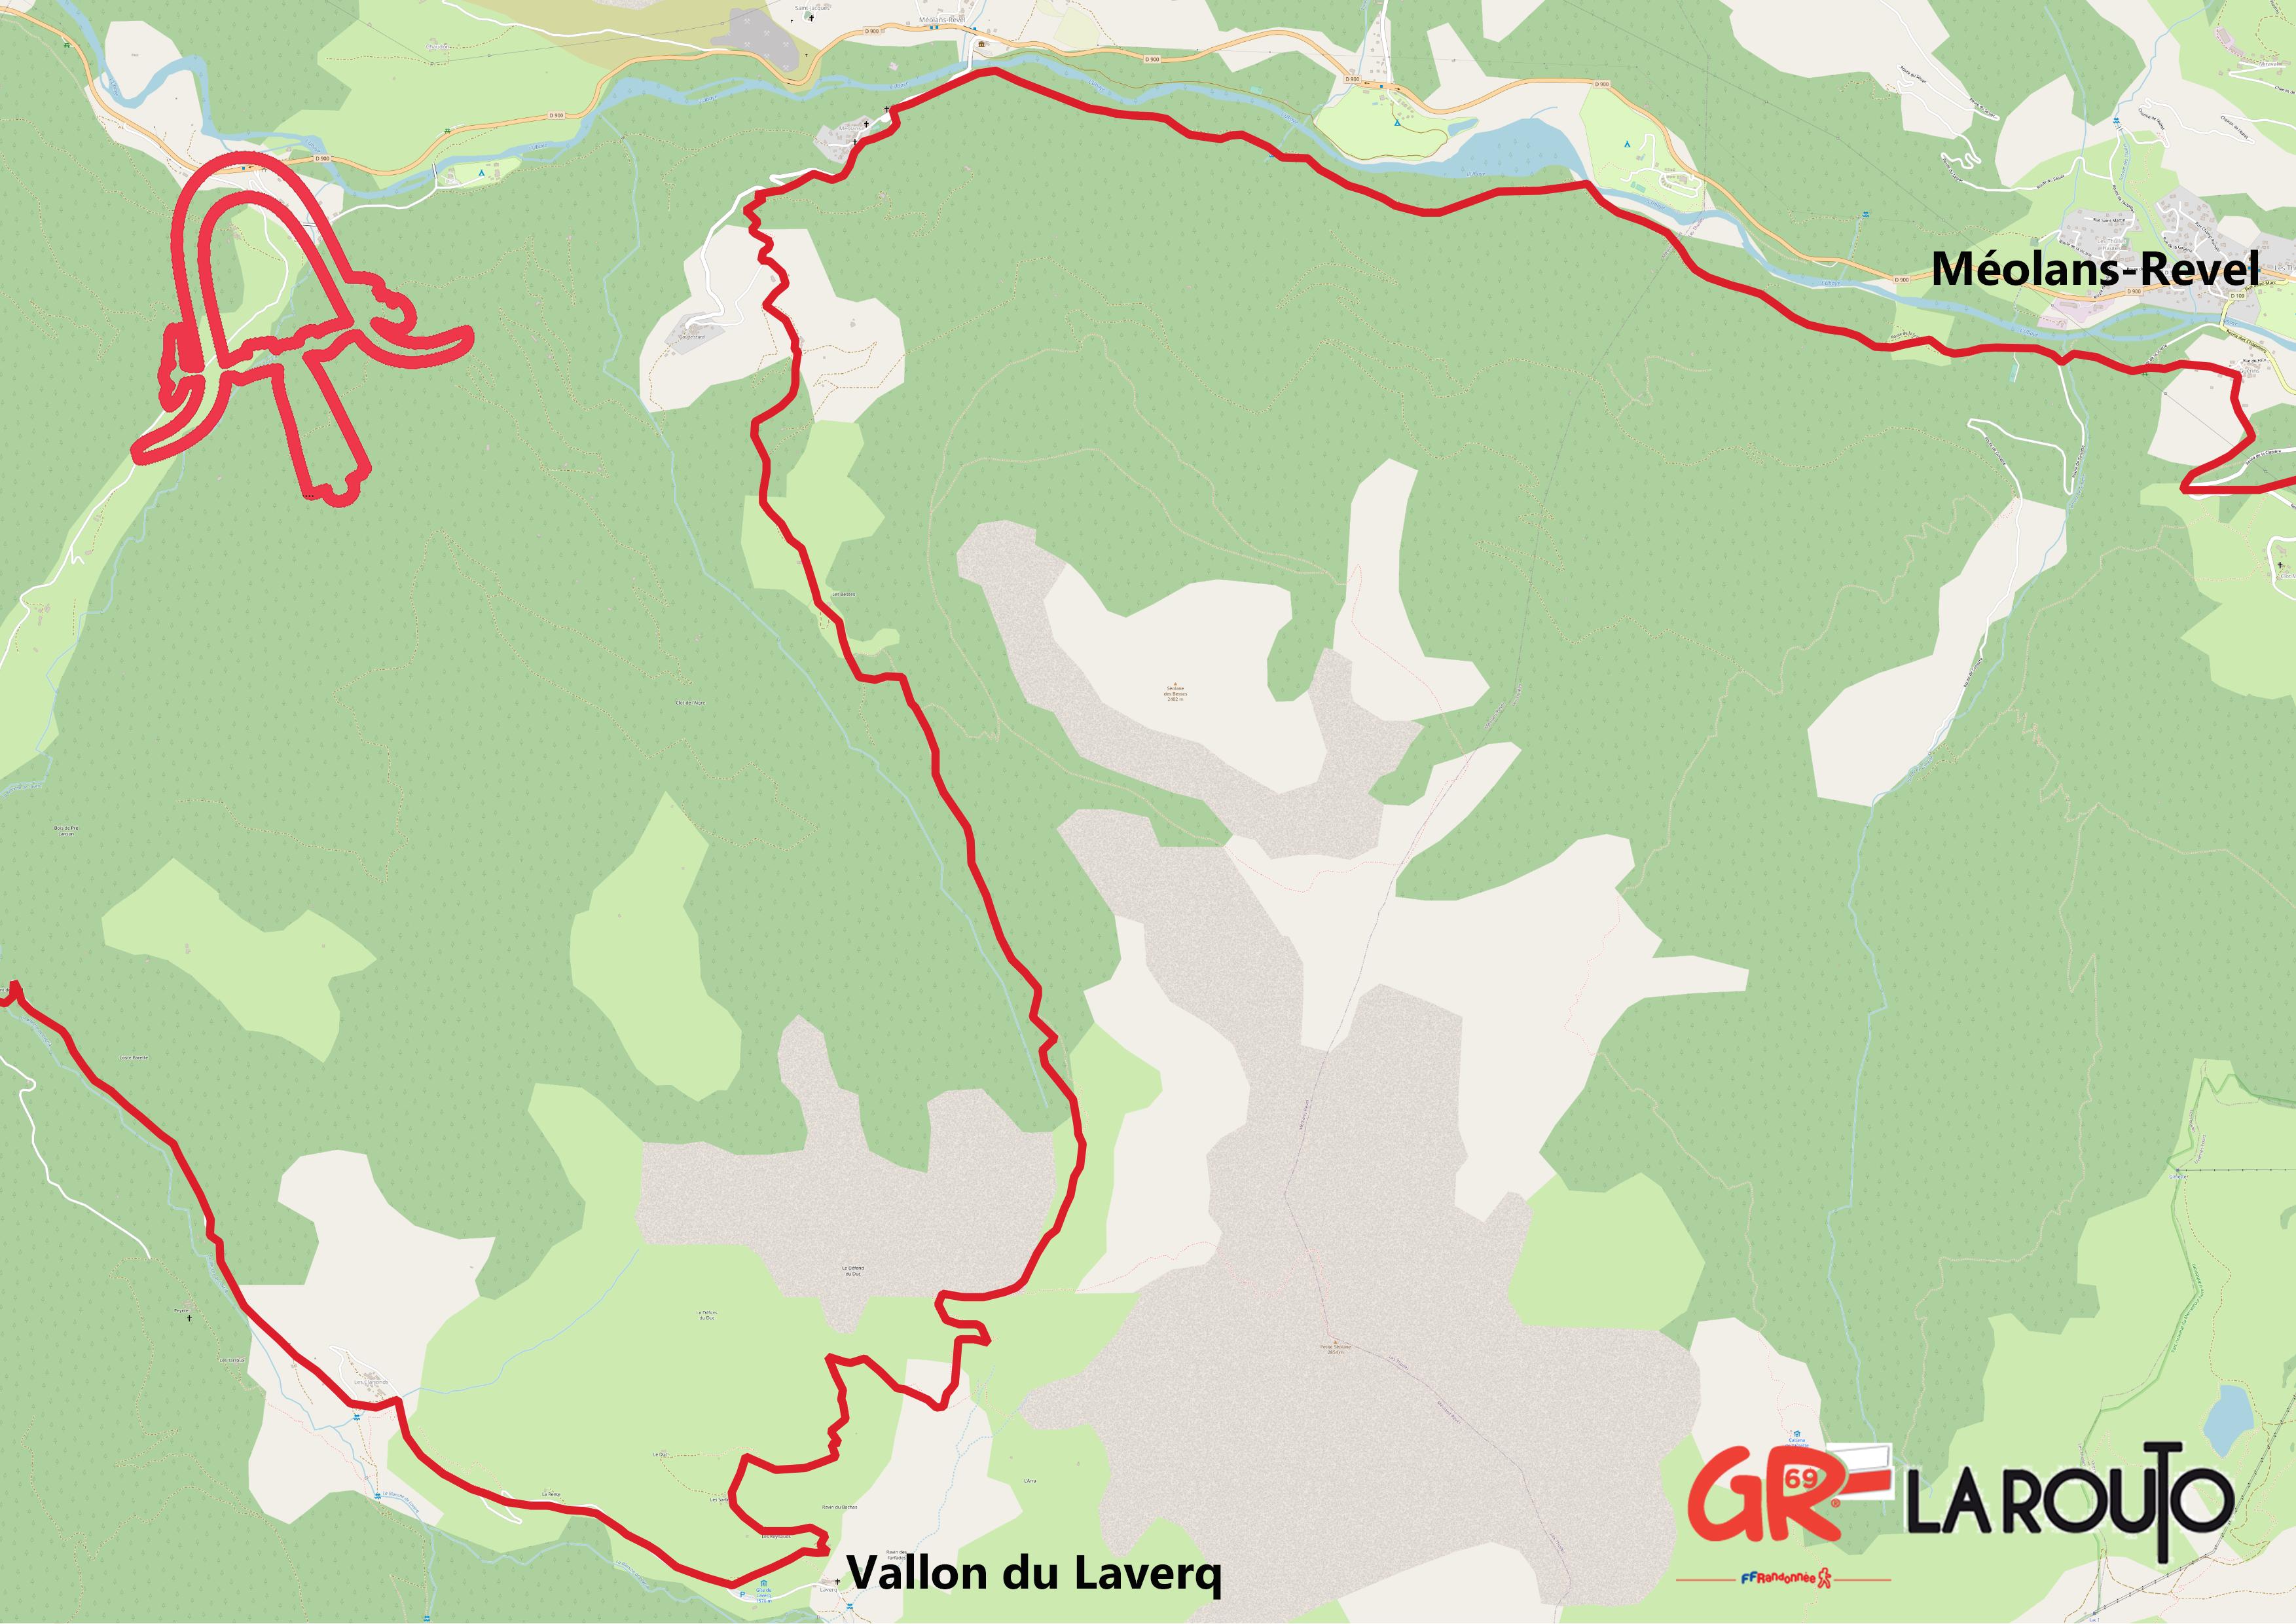 etape-20-vallon-du-laverq-meolans-revel